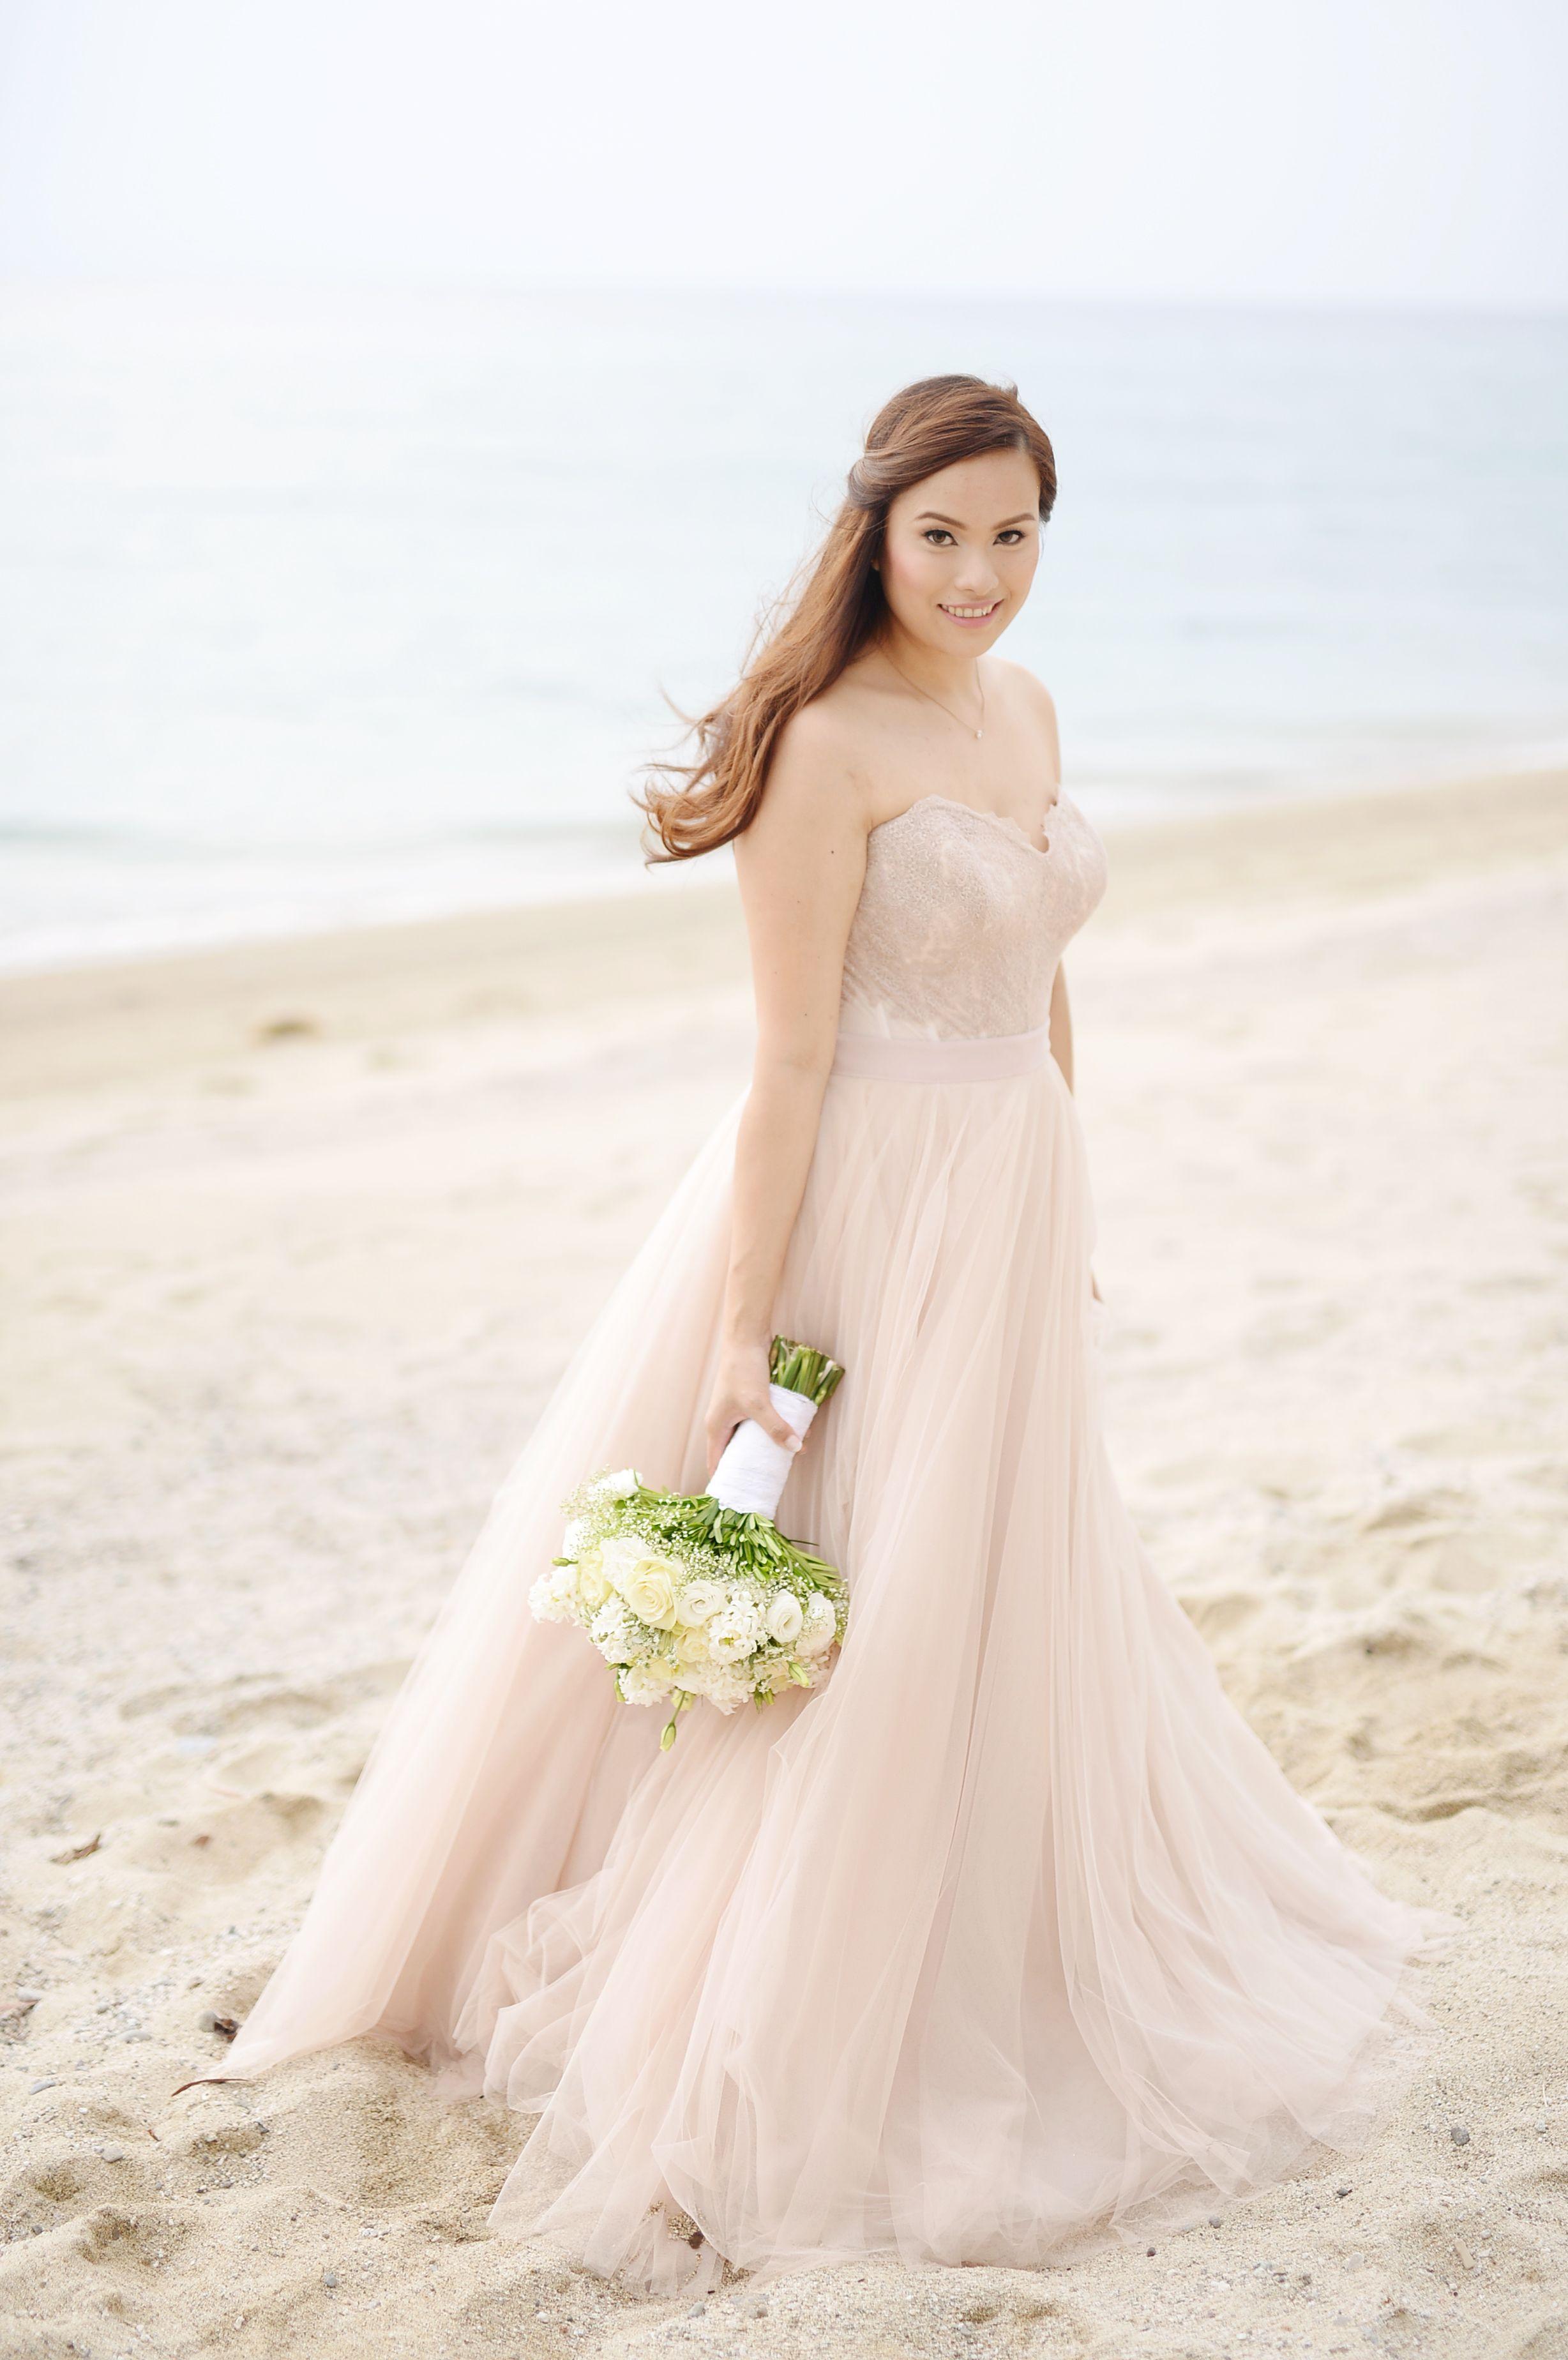 Watters Ahsan Skirt and Carina Corset #beachwedding   Weddings and ...